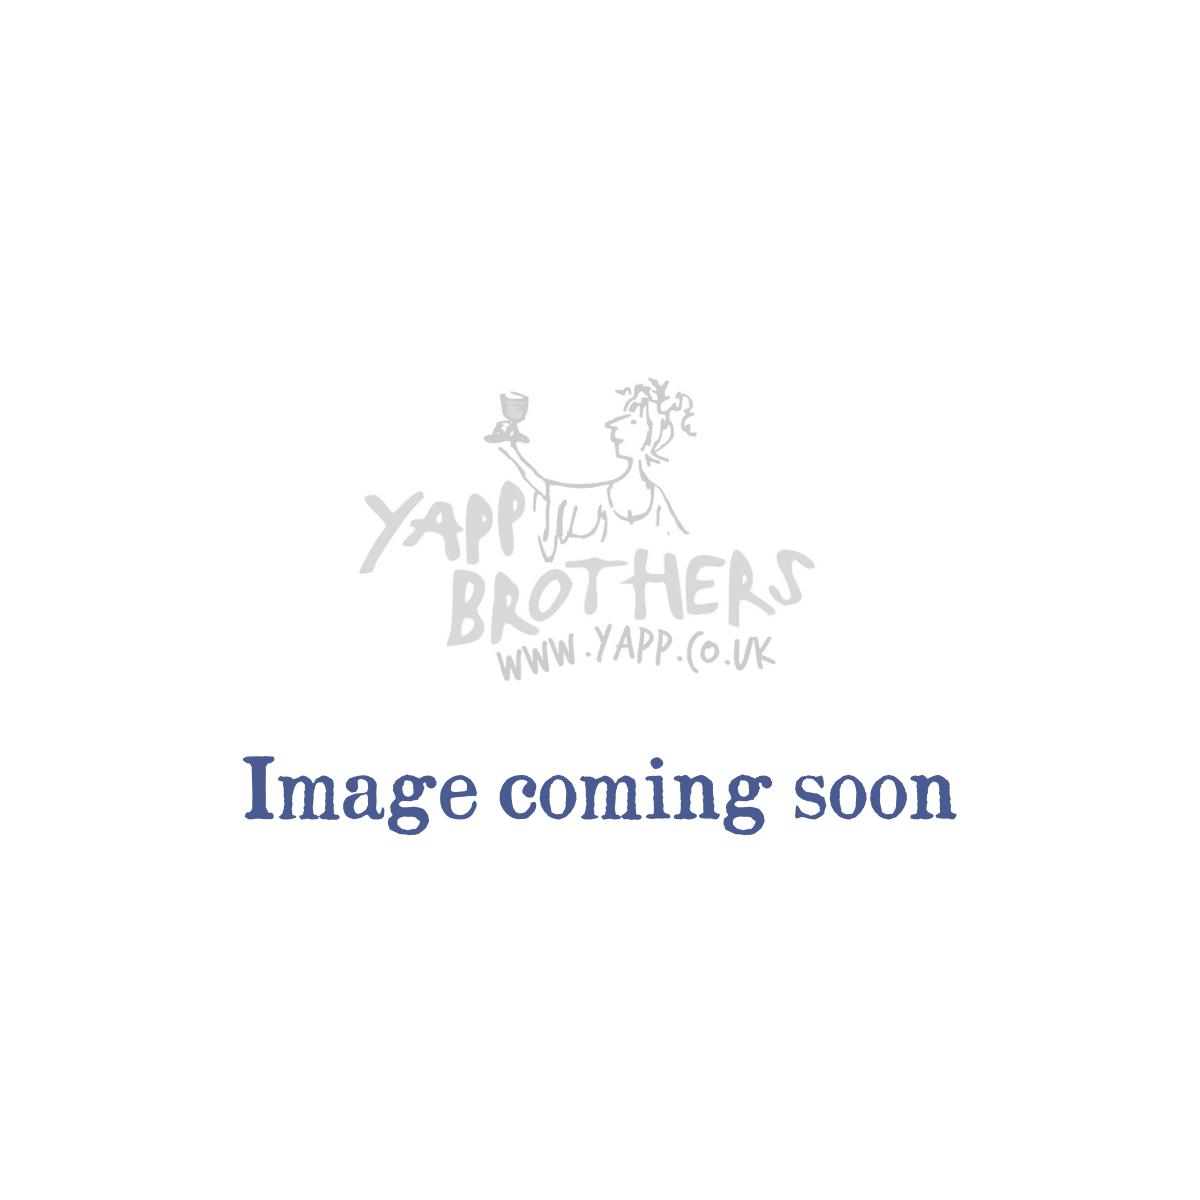 Chambolle Musigny: Domaine Misset-Cheron 'Les Condemennes' 2015 - Bottle